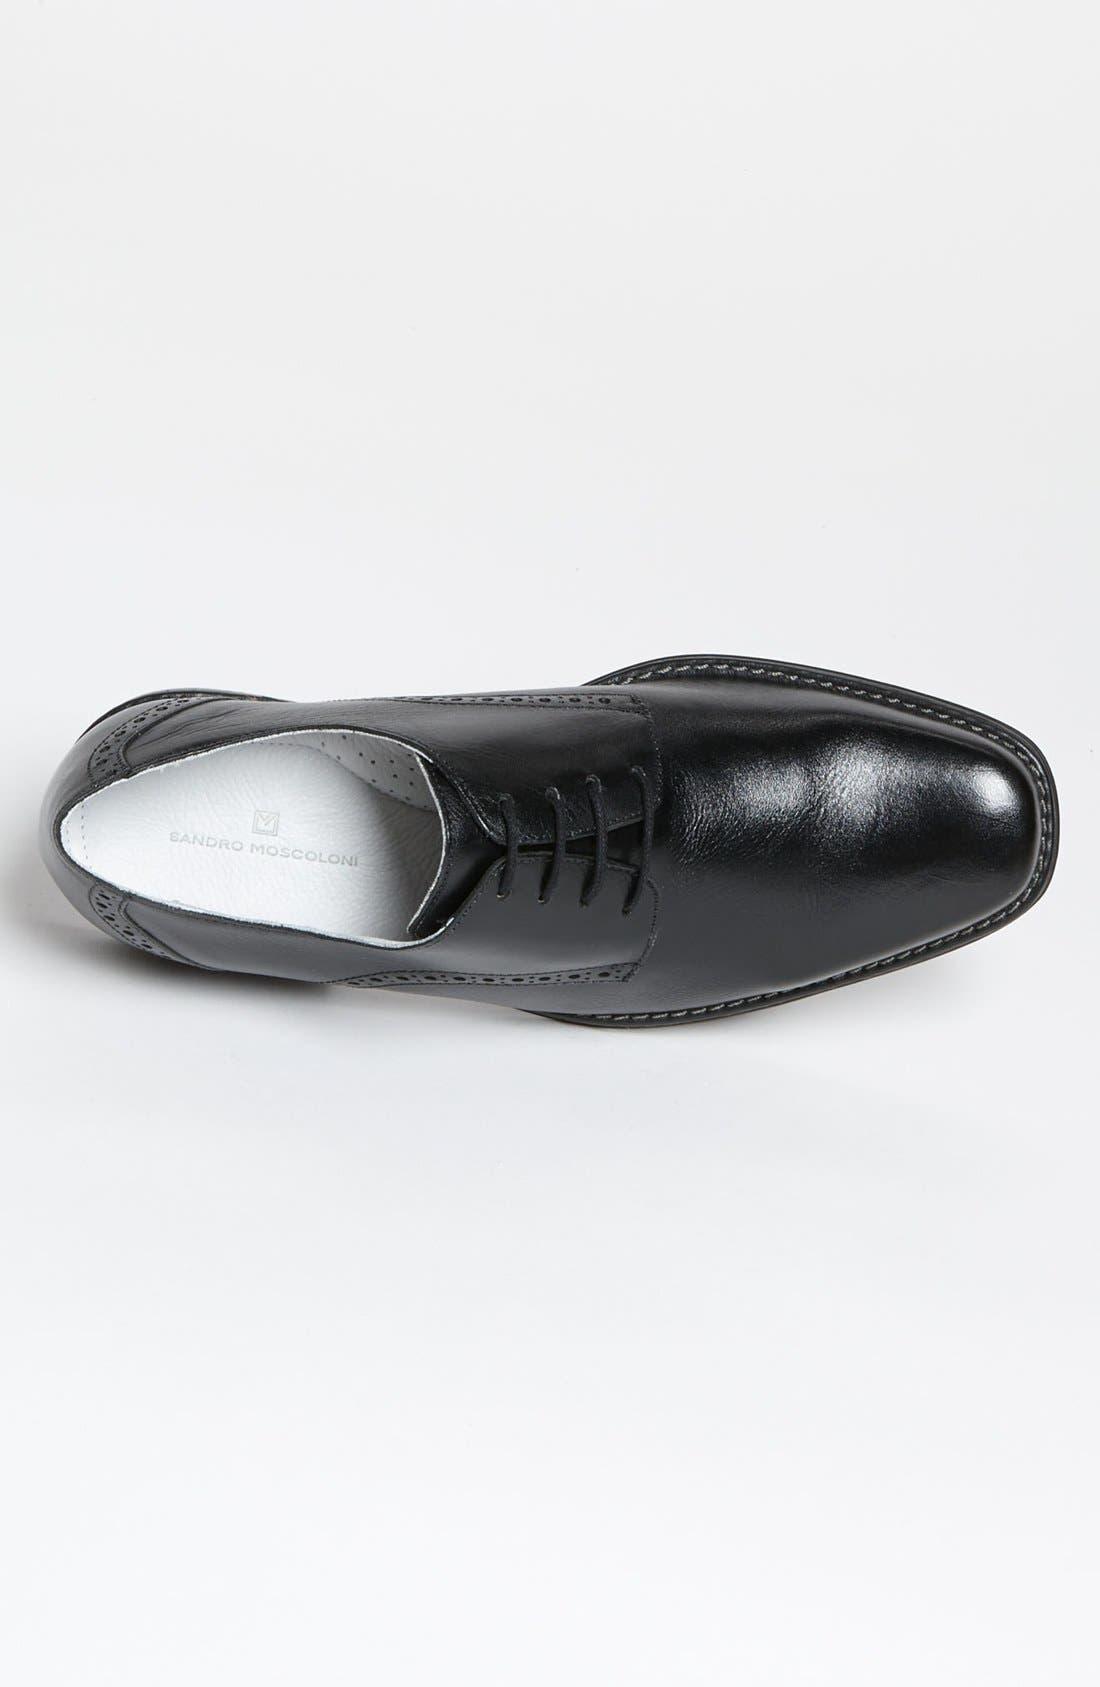 Alternate Image 3  - Sandro Moscoloni 'Yale' Plain Toe Derby